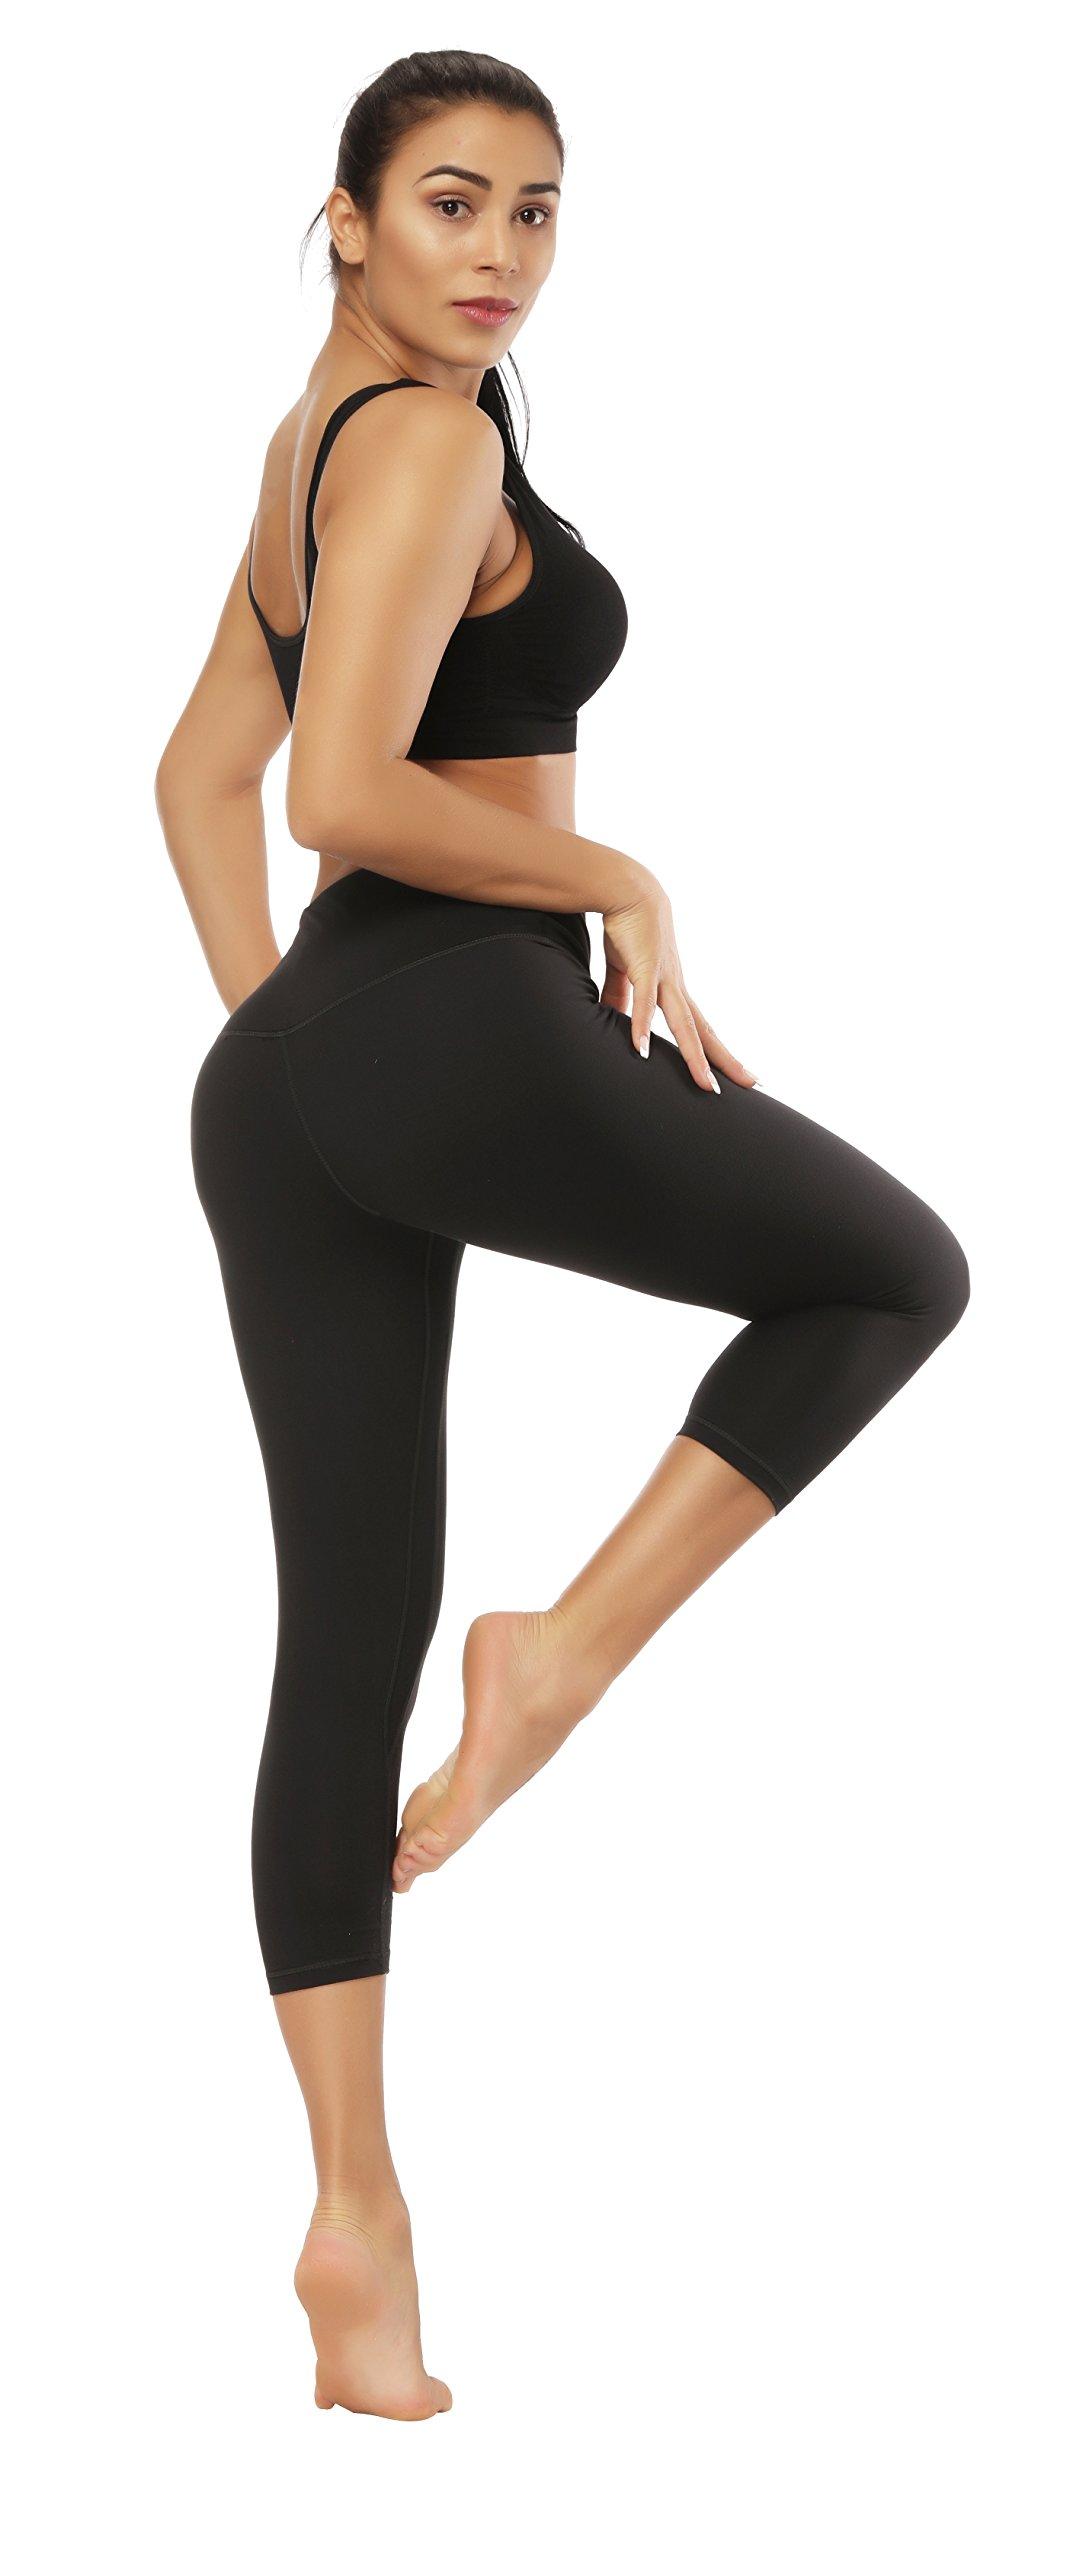 Fengbay Capris Leggings, Capris Yoga Pants Tummy Control Workout Running 4 Way Stretch High Waist Capris Workout Leggings by Fengbay (Image #4)